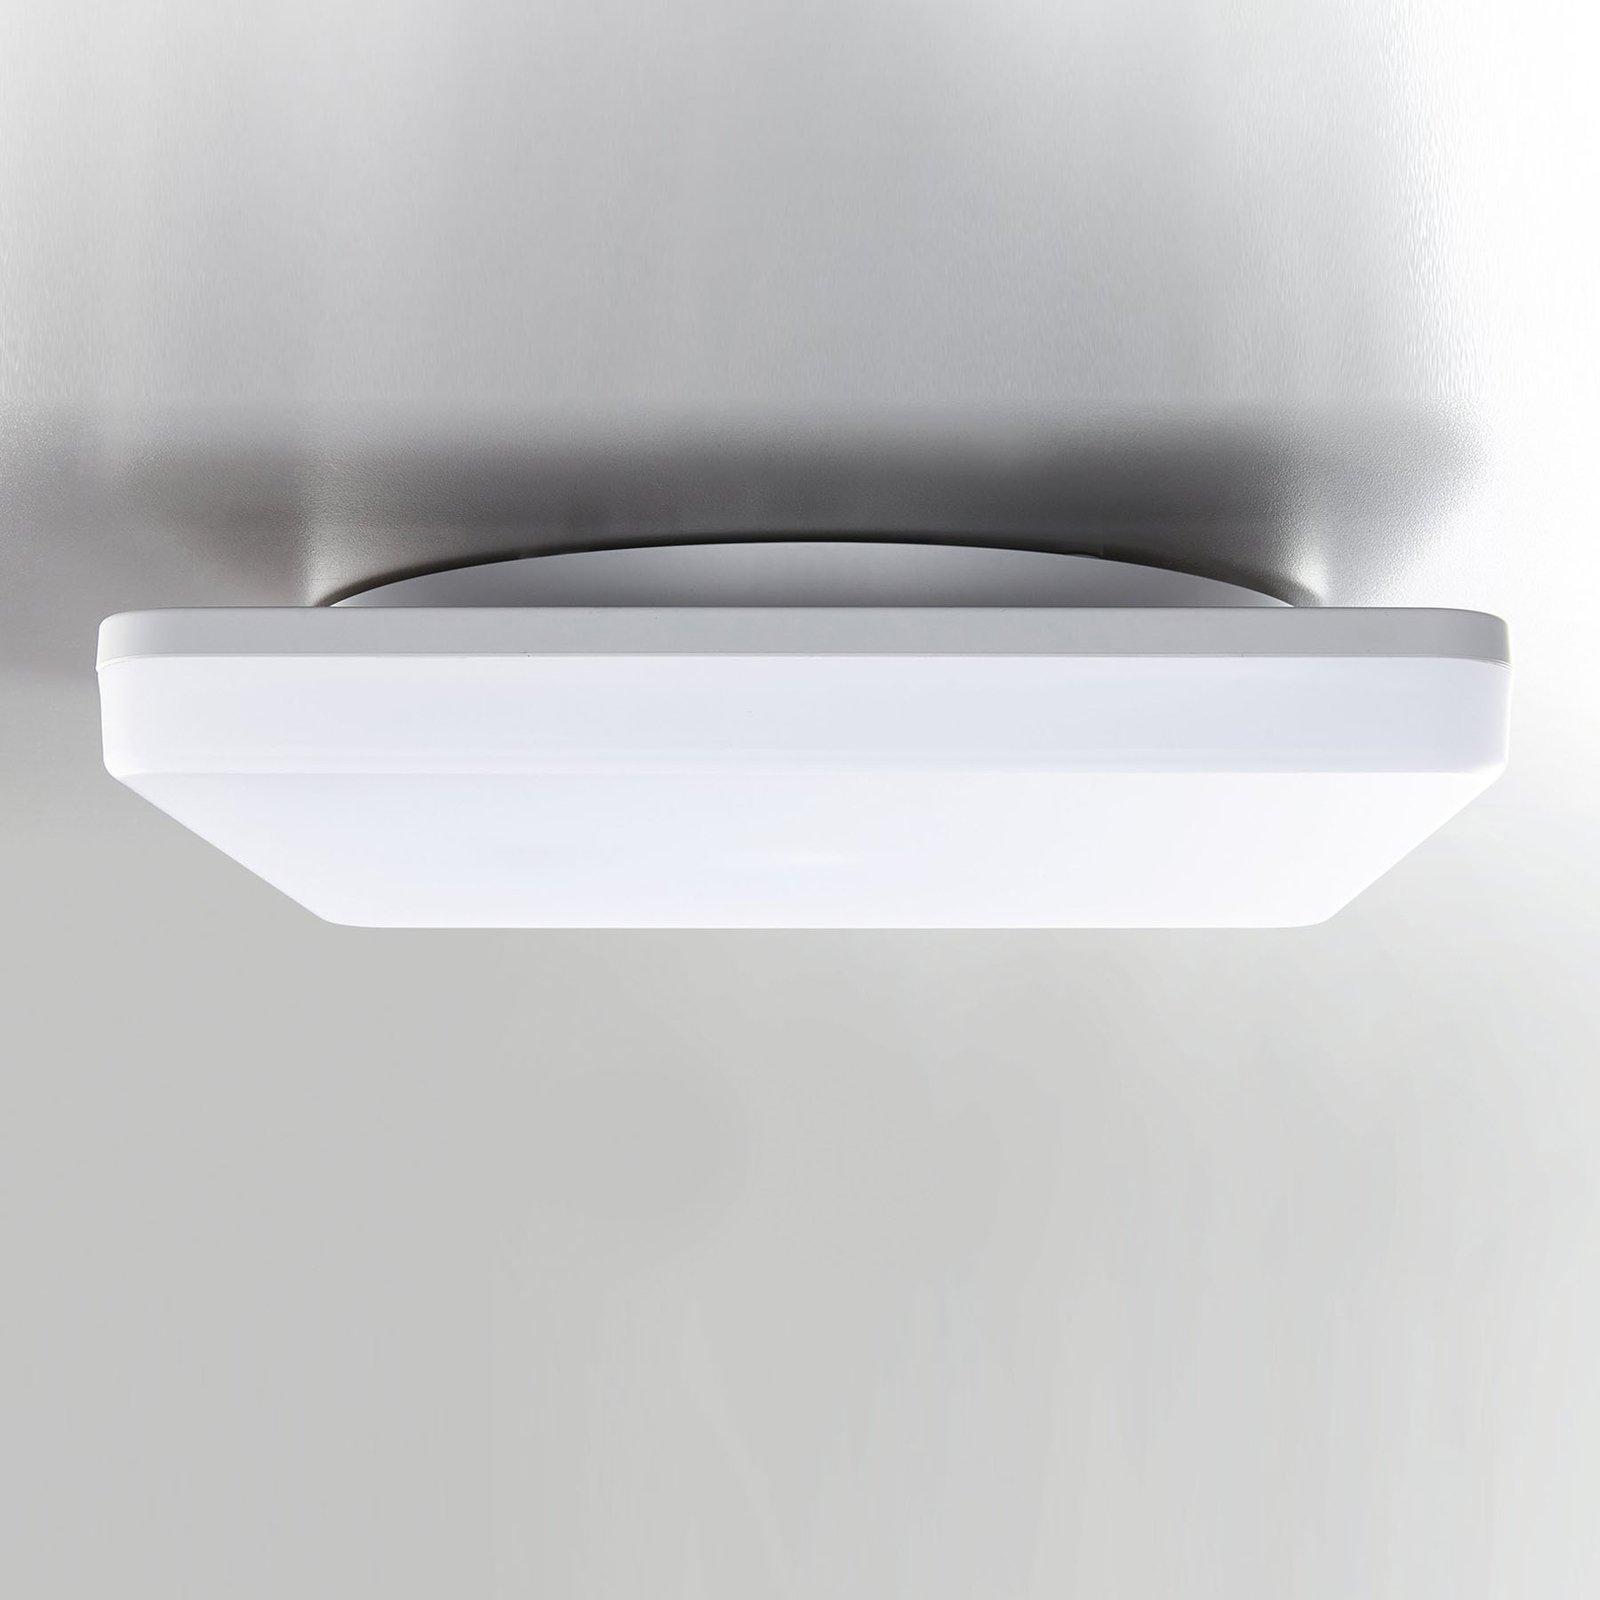 LED-taklampe Pronto 33 x 33 cm